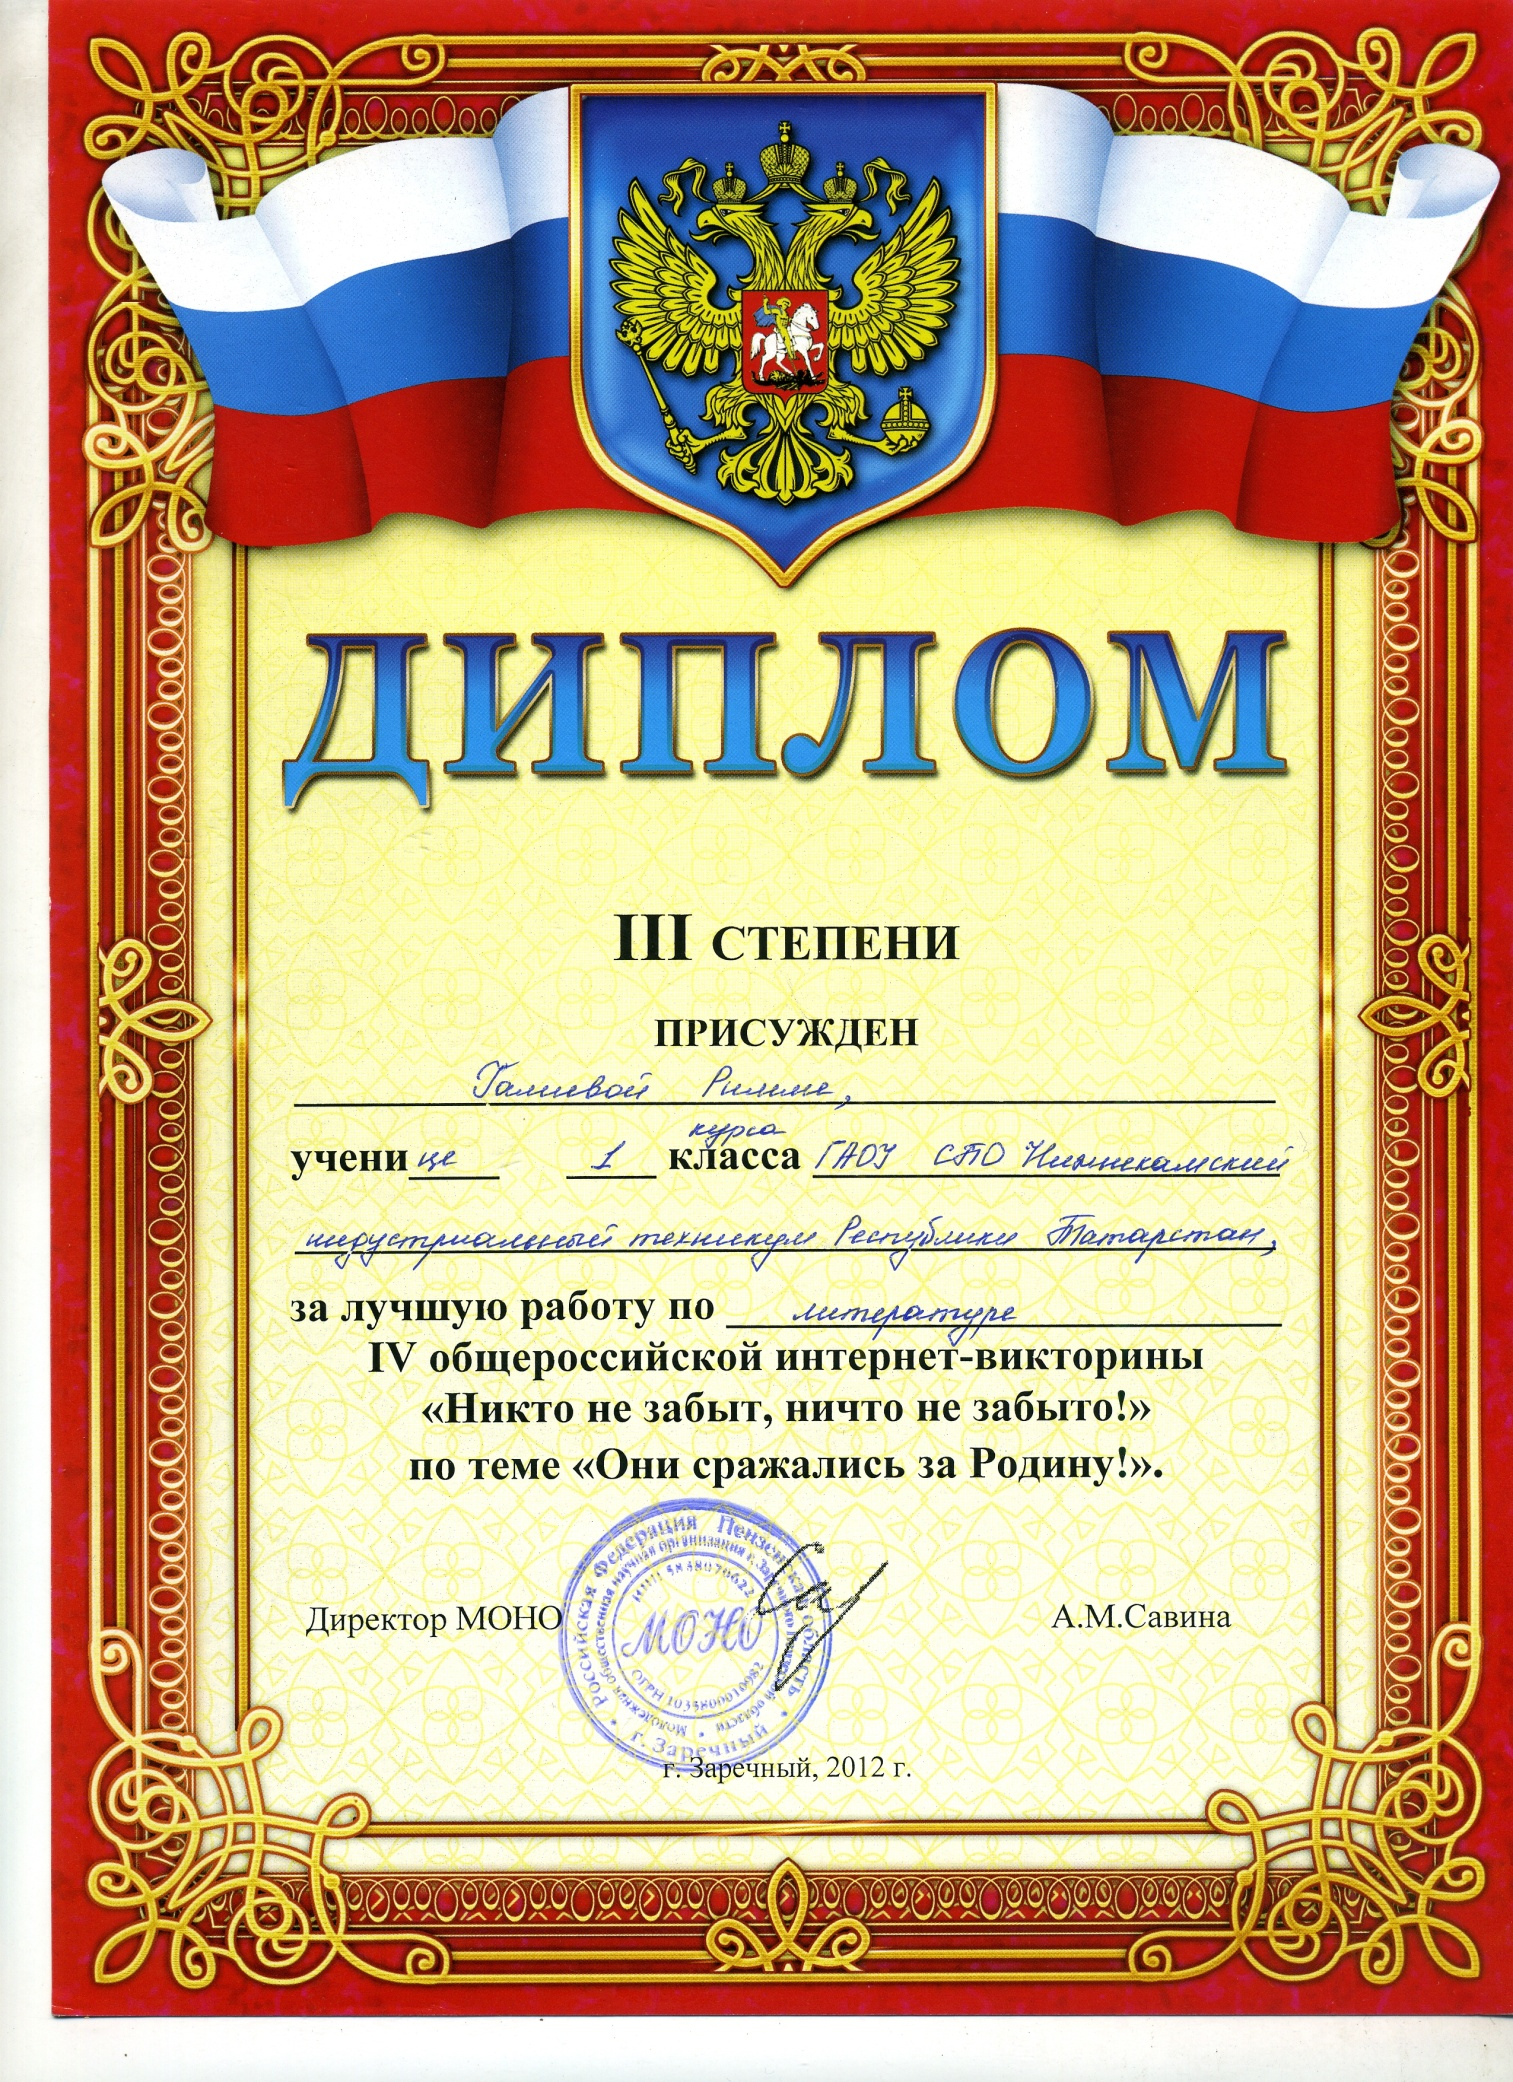 F:\Всероссйский конкурс Портфолио выпускника\РИММА\img766.jpg